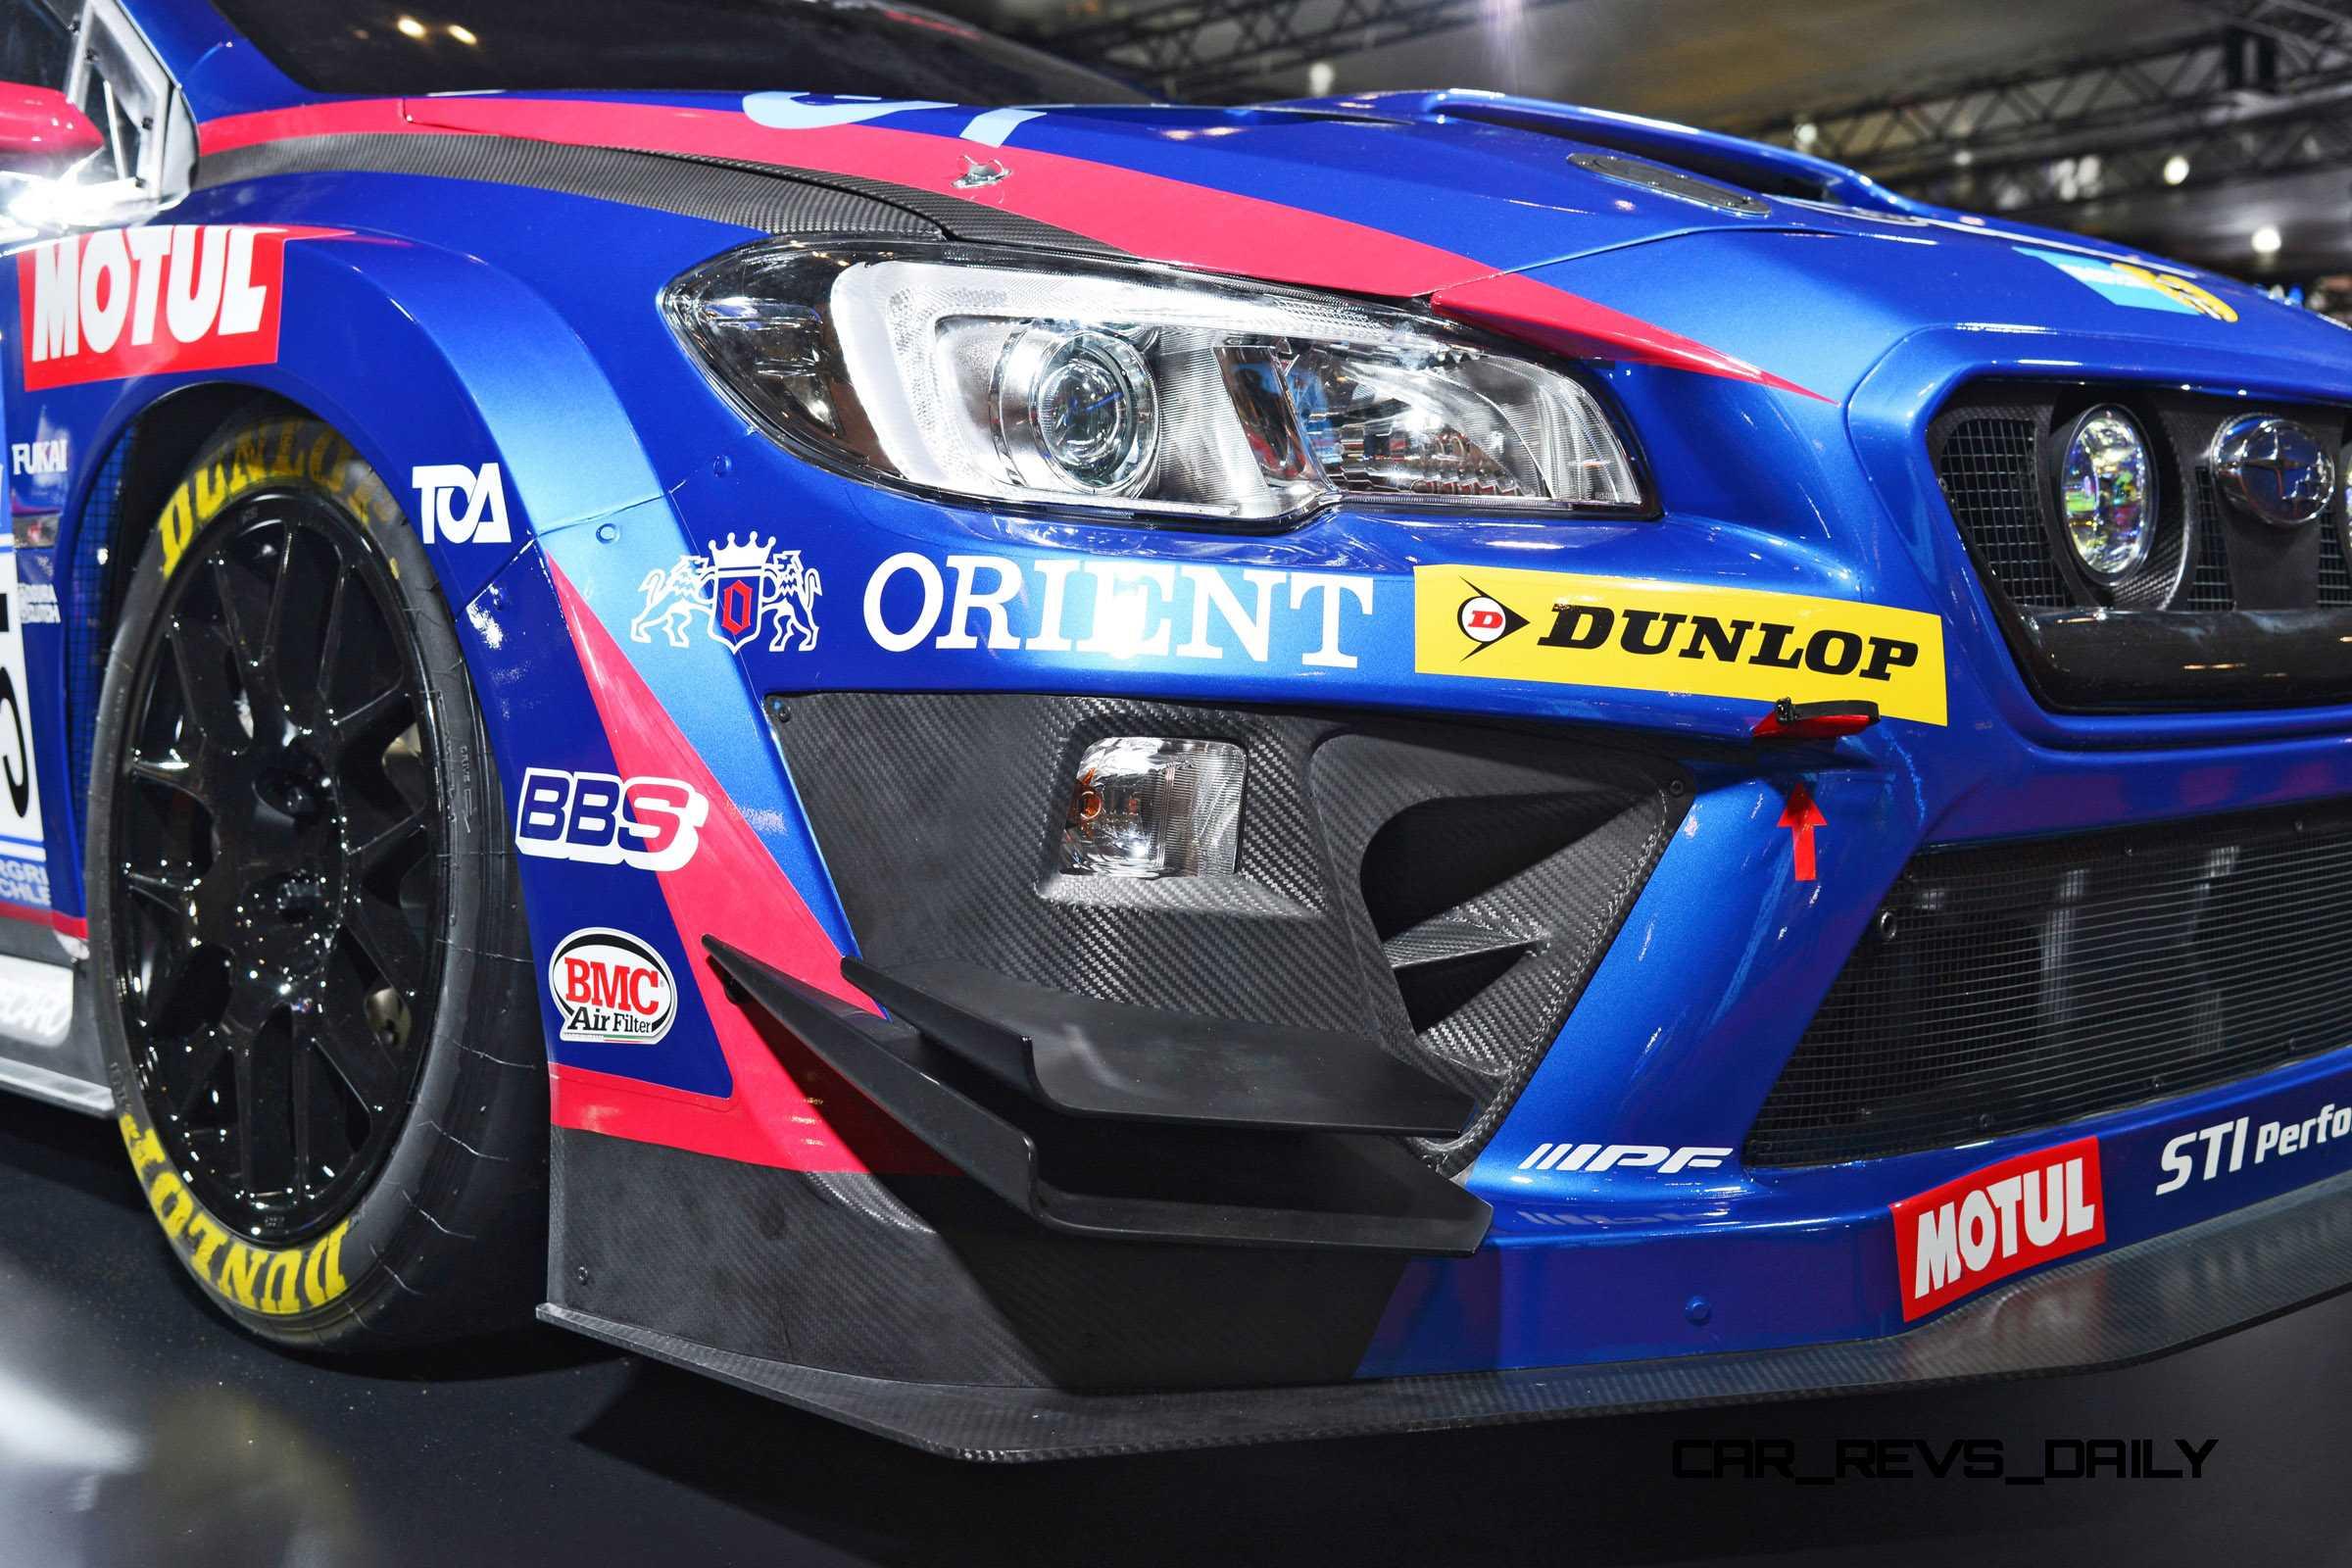 2015 Subaru BRZ GT300 and WRX NBR